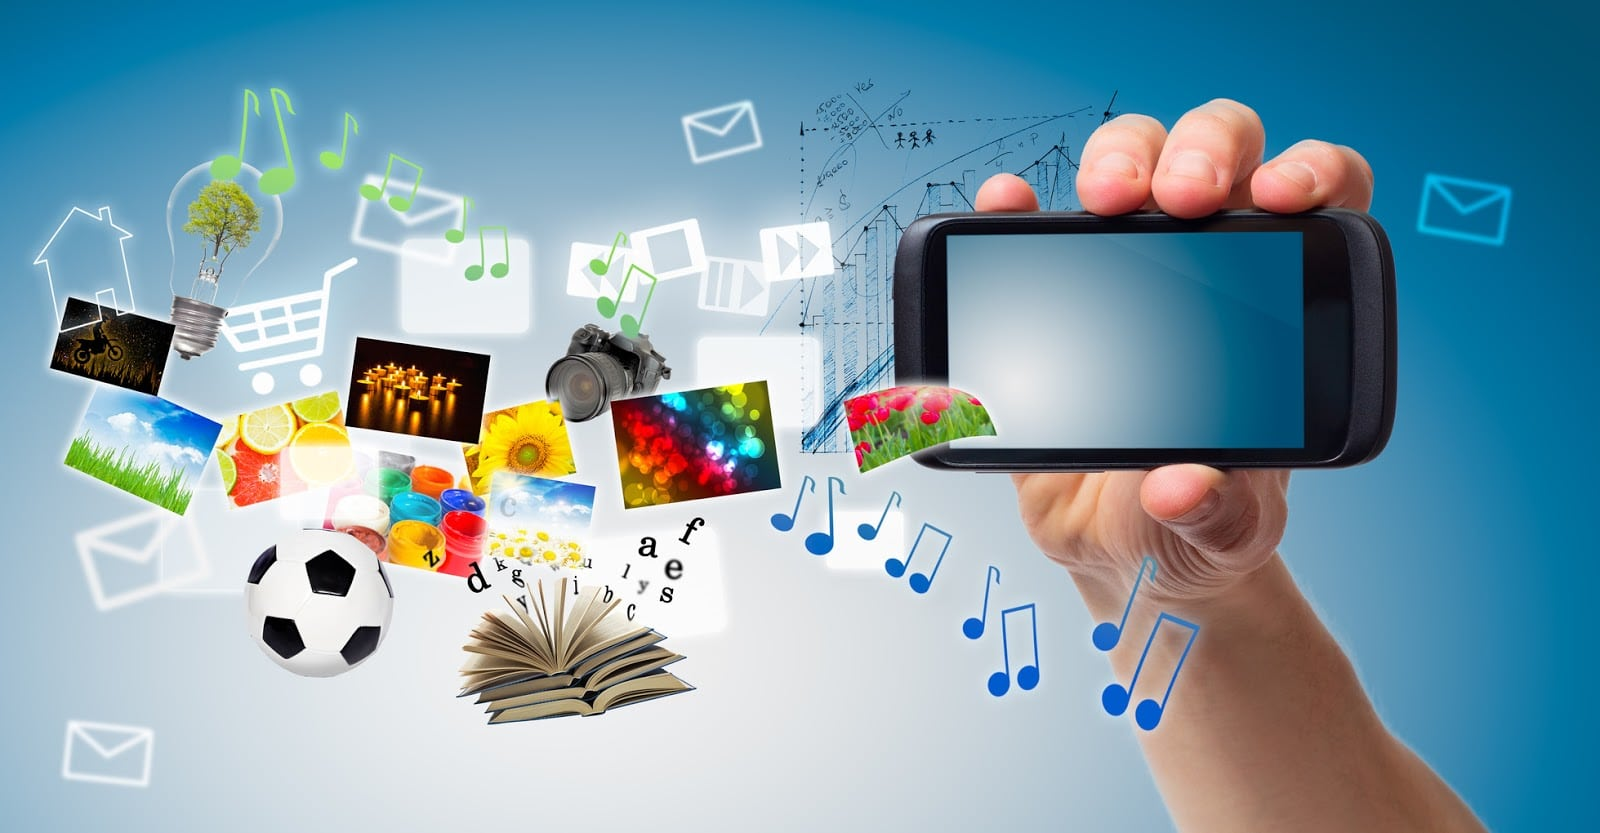 Ilustrasi Multimedia Phone